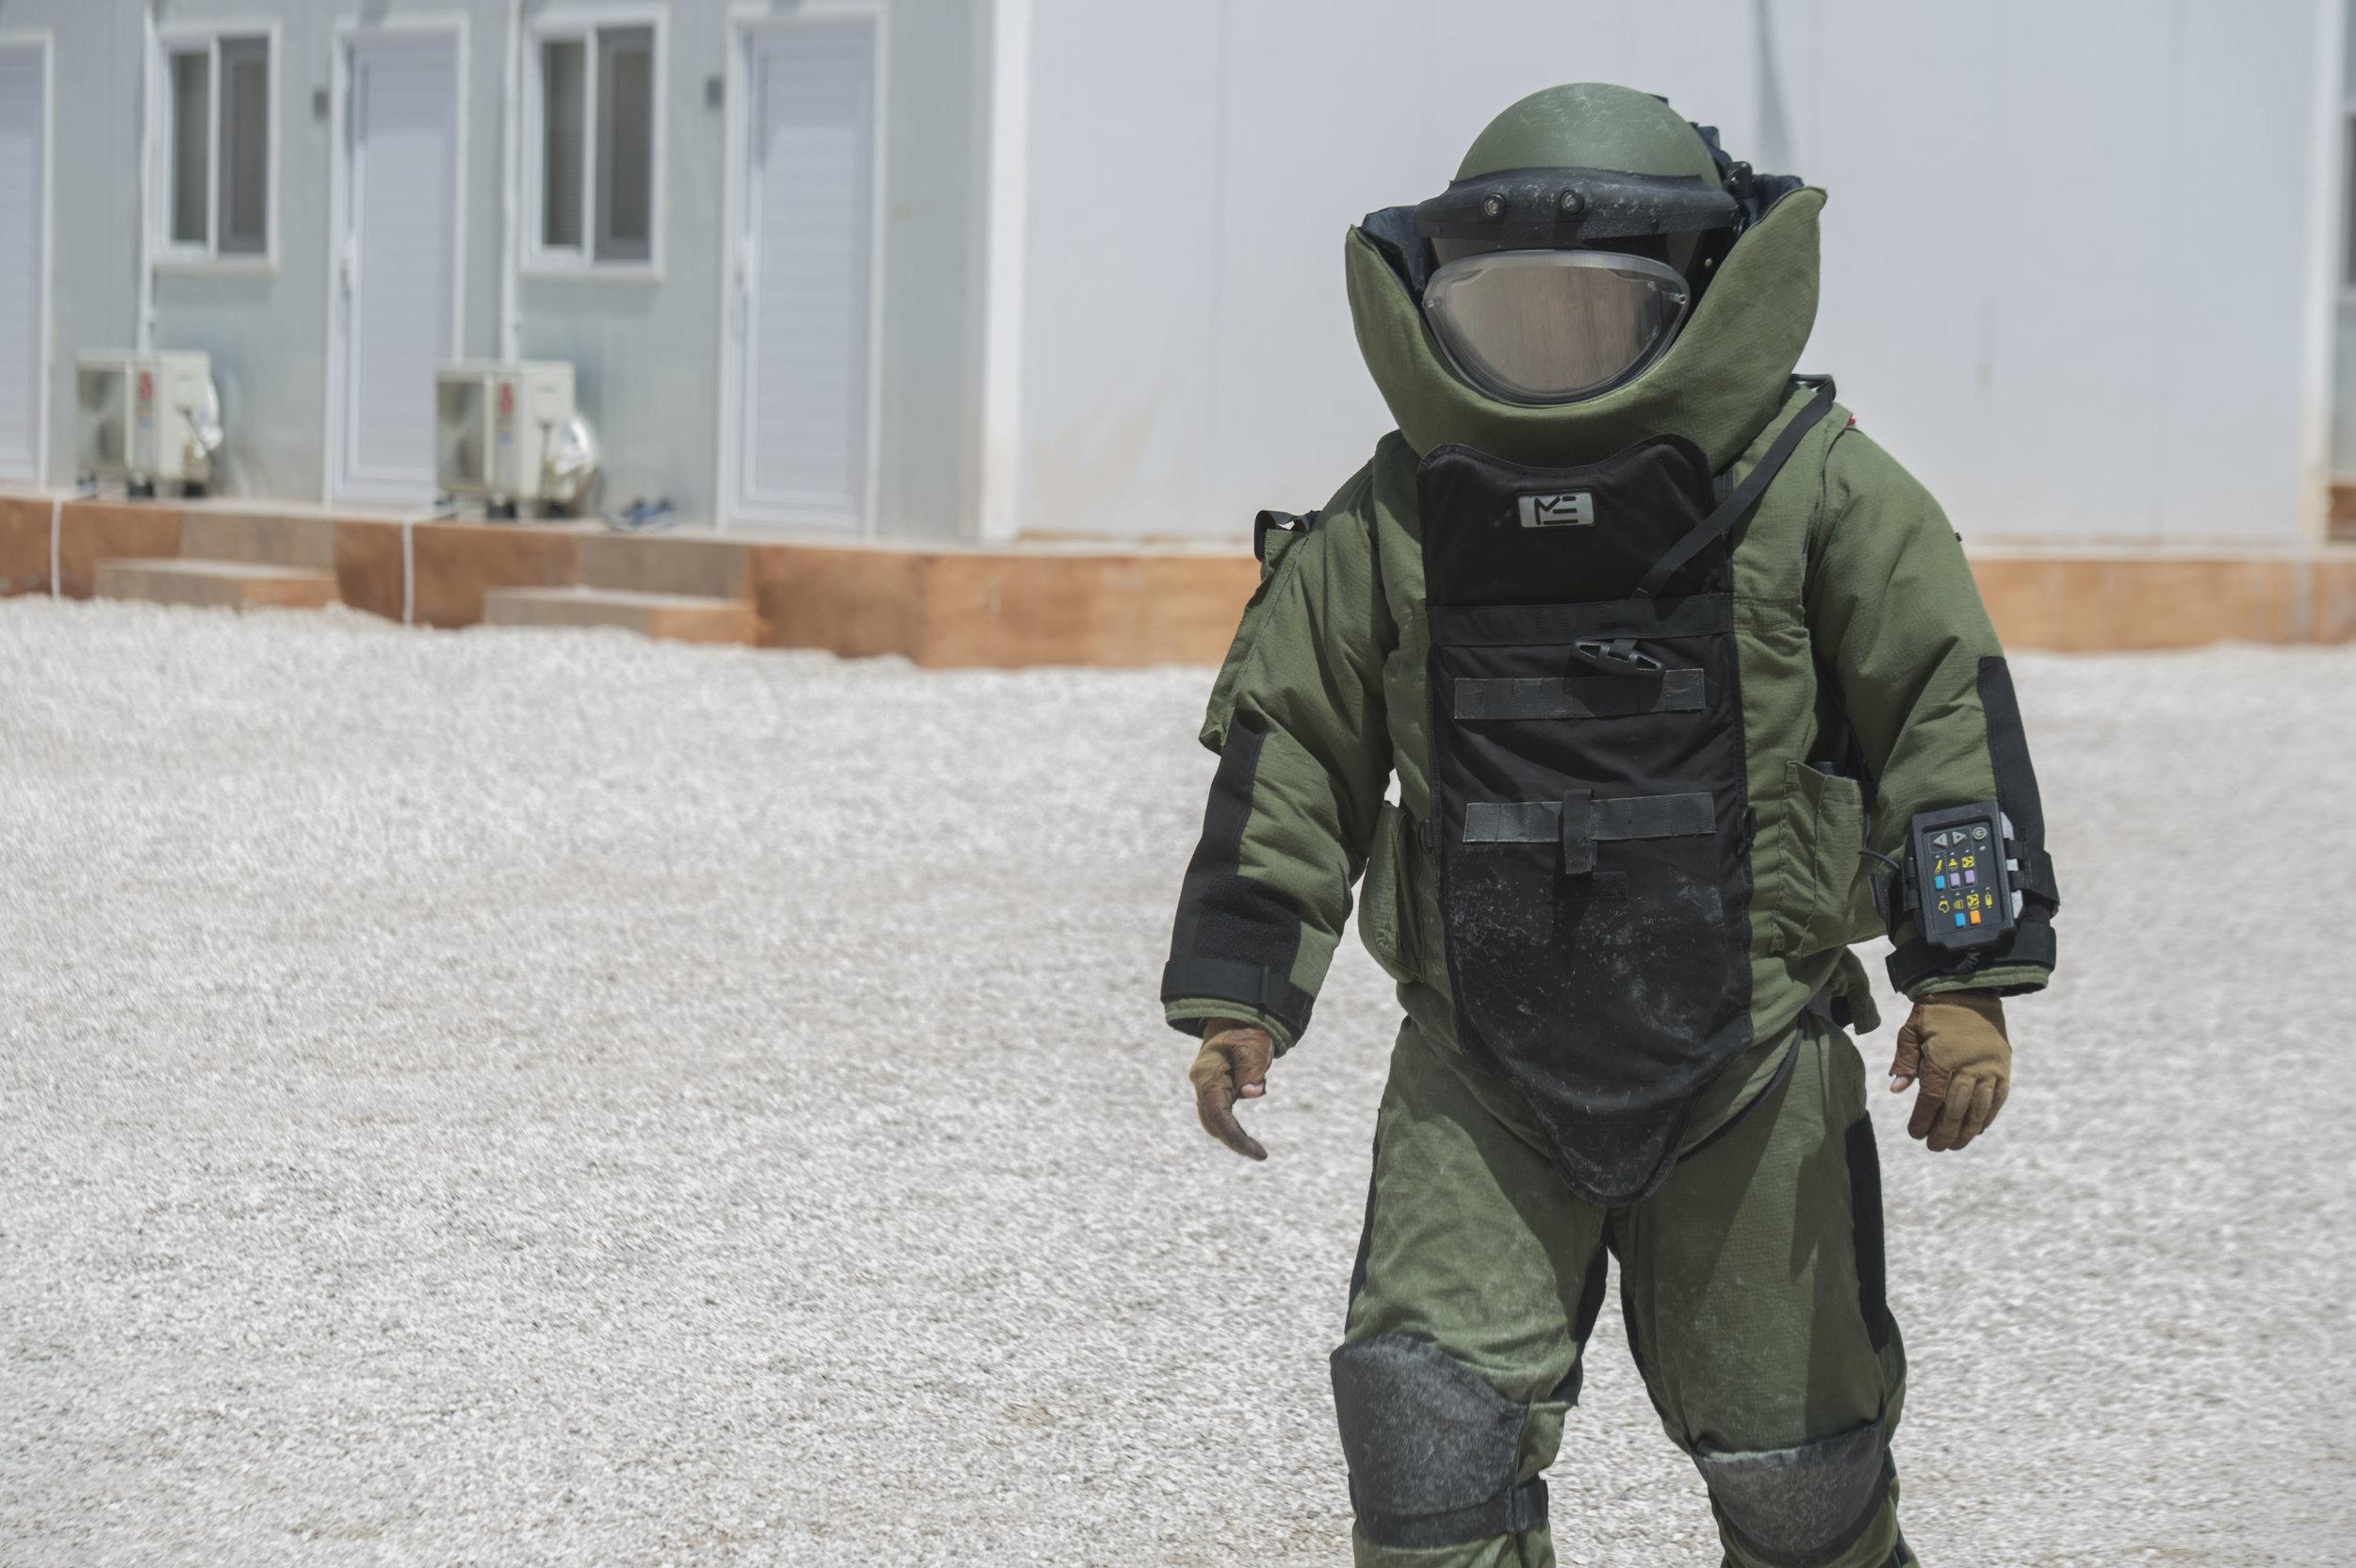 EOD technician in full protective gear